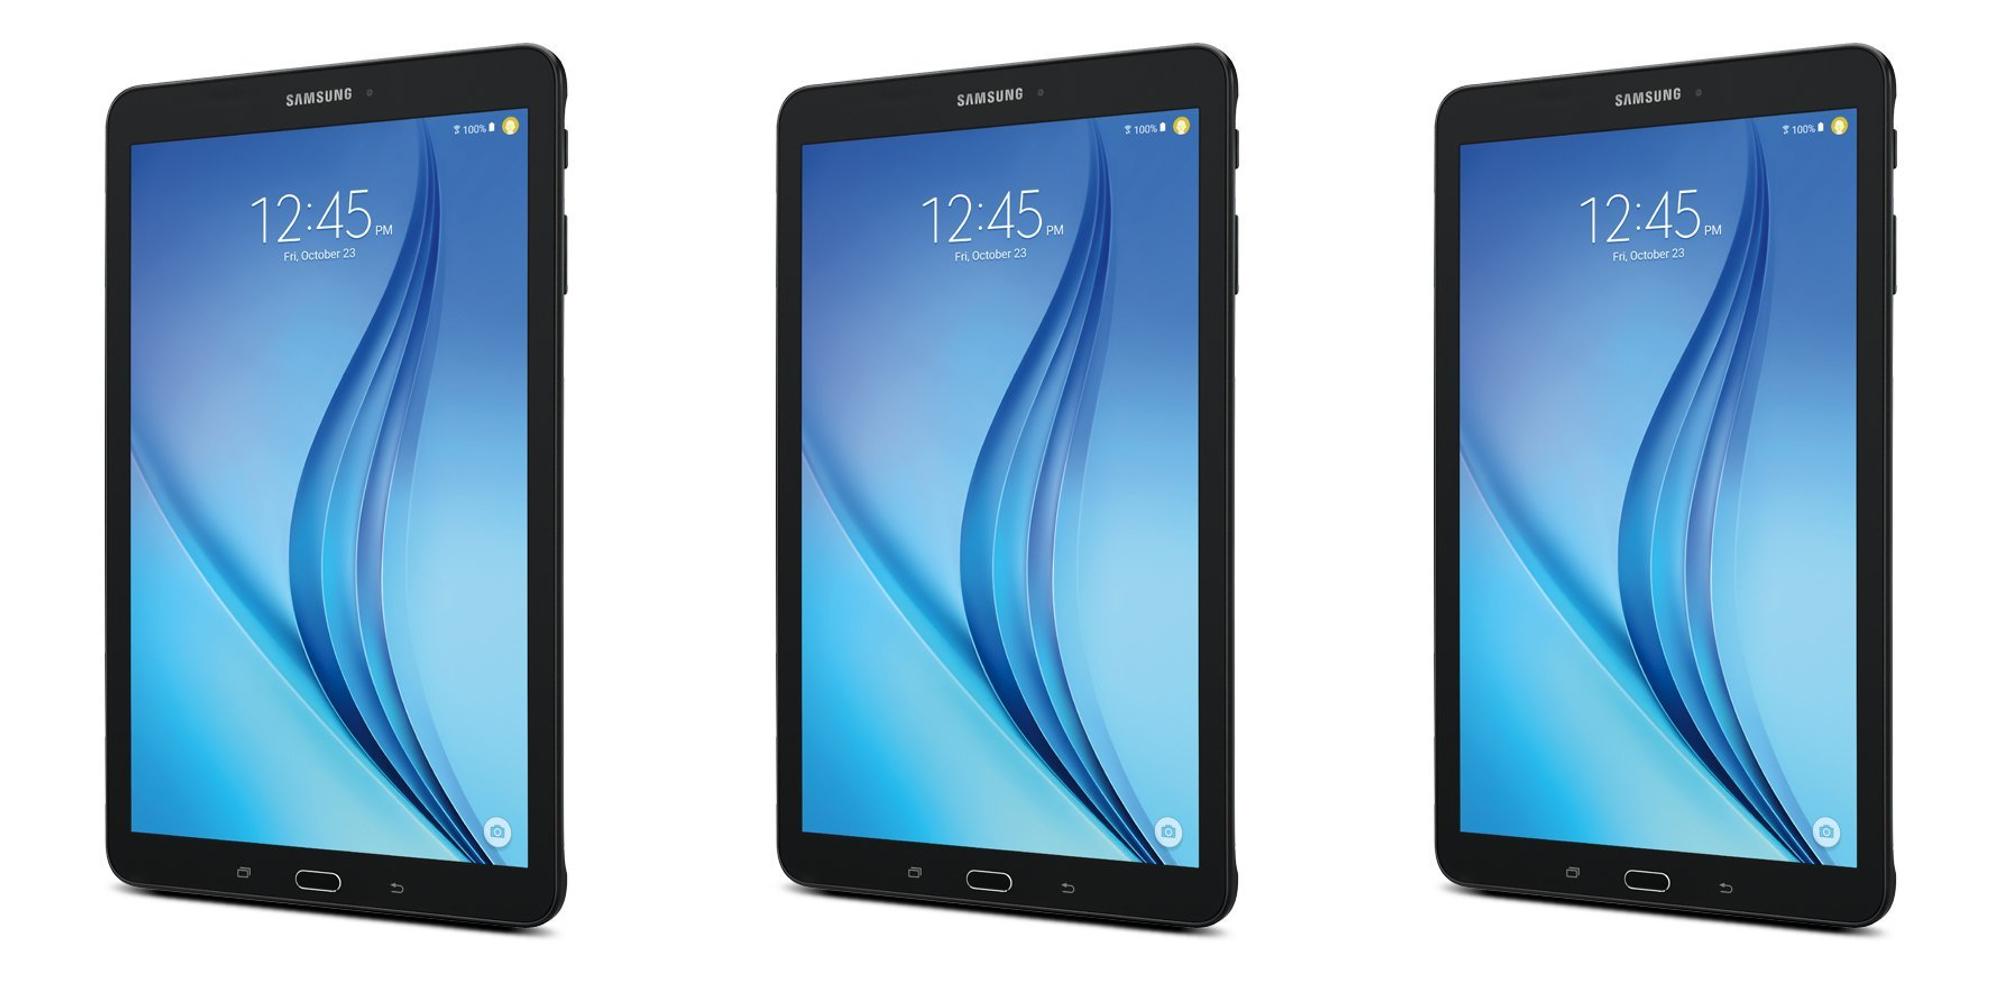 9to5Toys Mittagspause: Samsung Galaxy Tab E 16 GB $ 150, DJI Spark Bundle (Refurb) $ 349, Yamaha Sound Bar $ 150, mehr